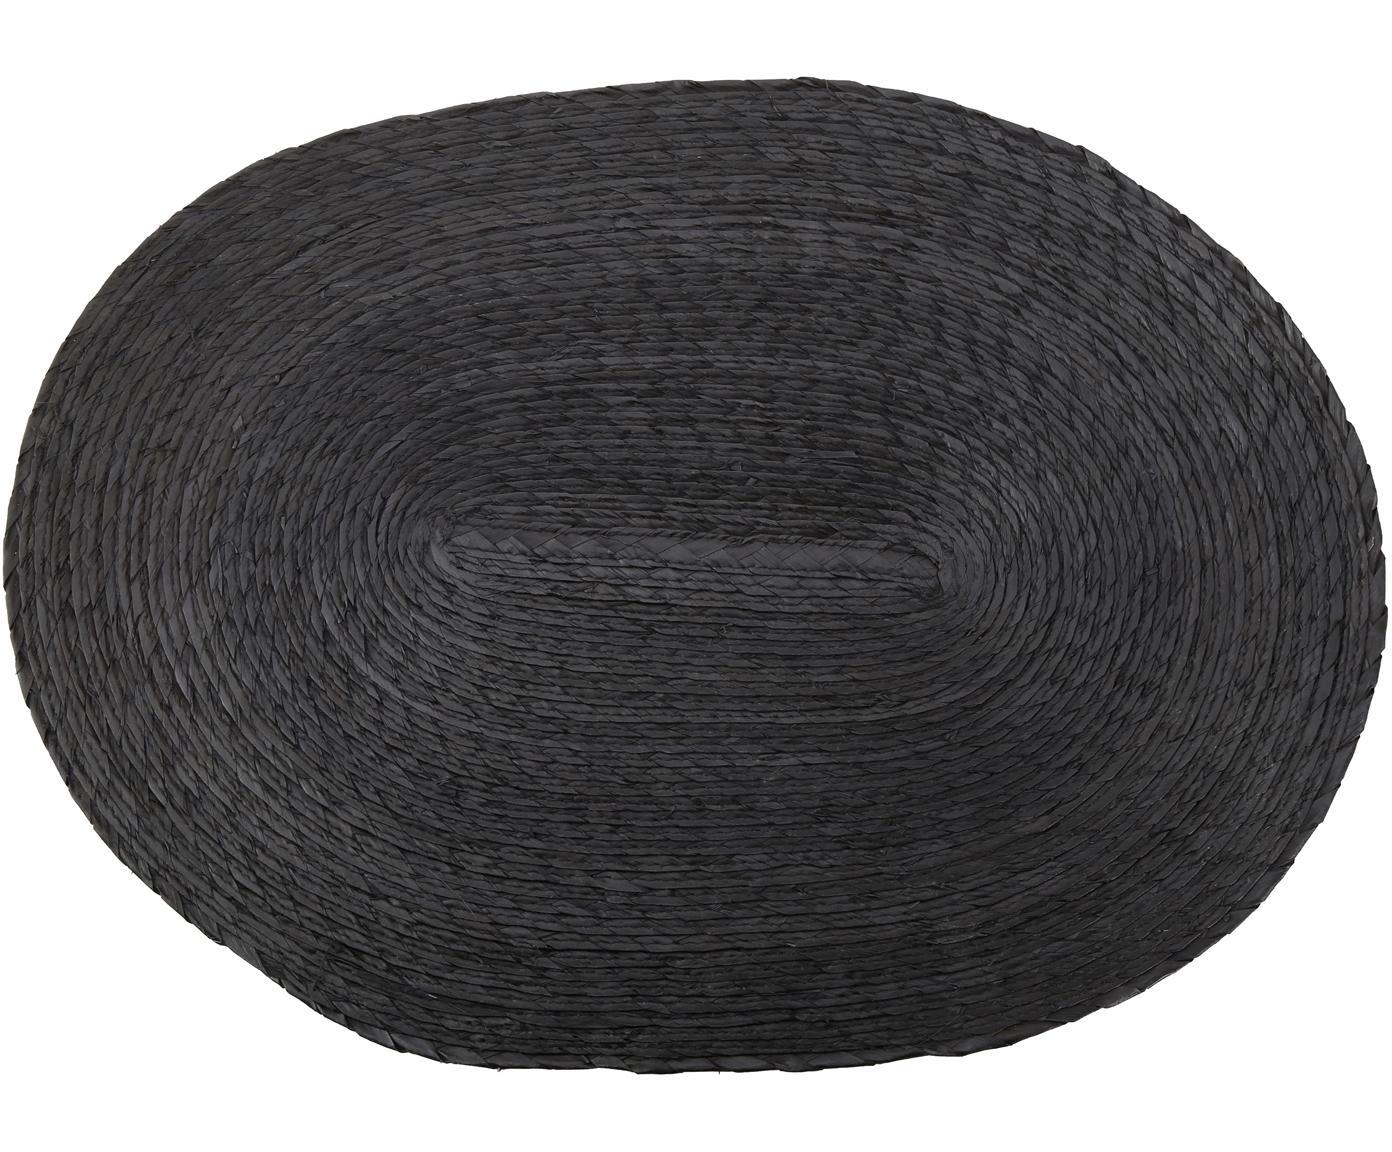 Owalna podkładka Mineola, 2 szt., Liście palmowe, Czarny, S 33 x D 46 cm